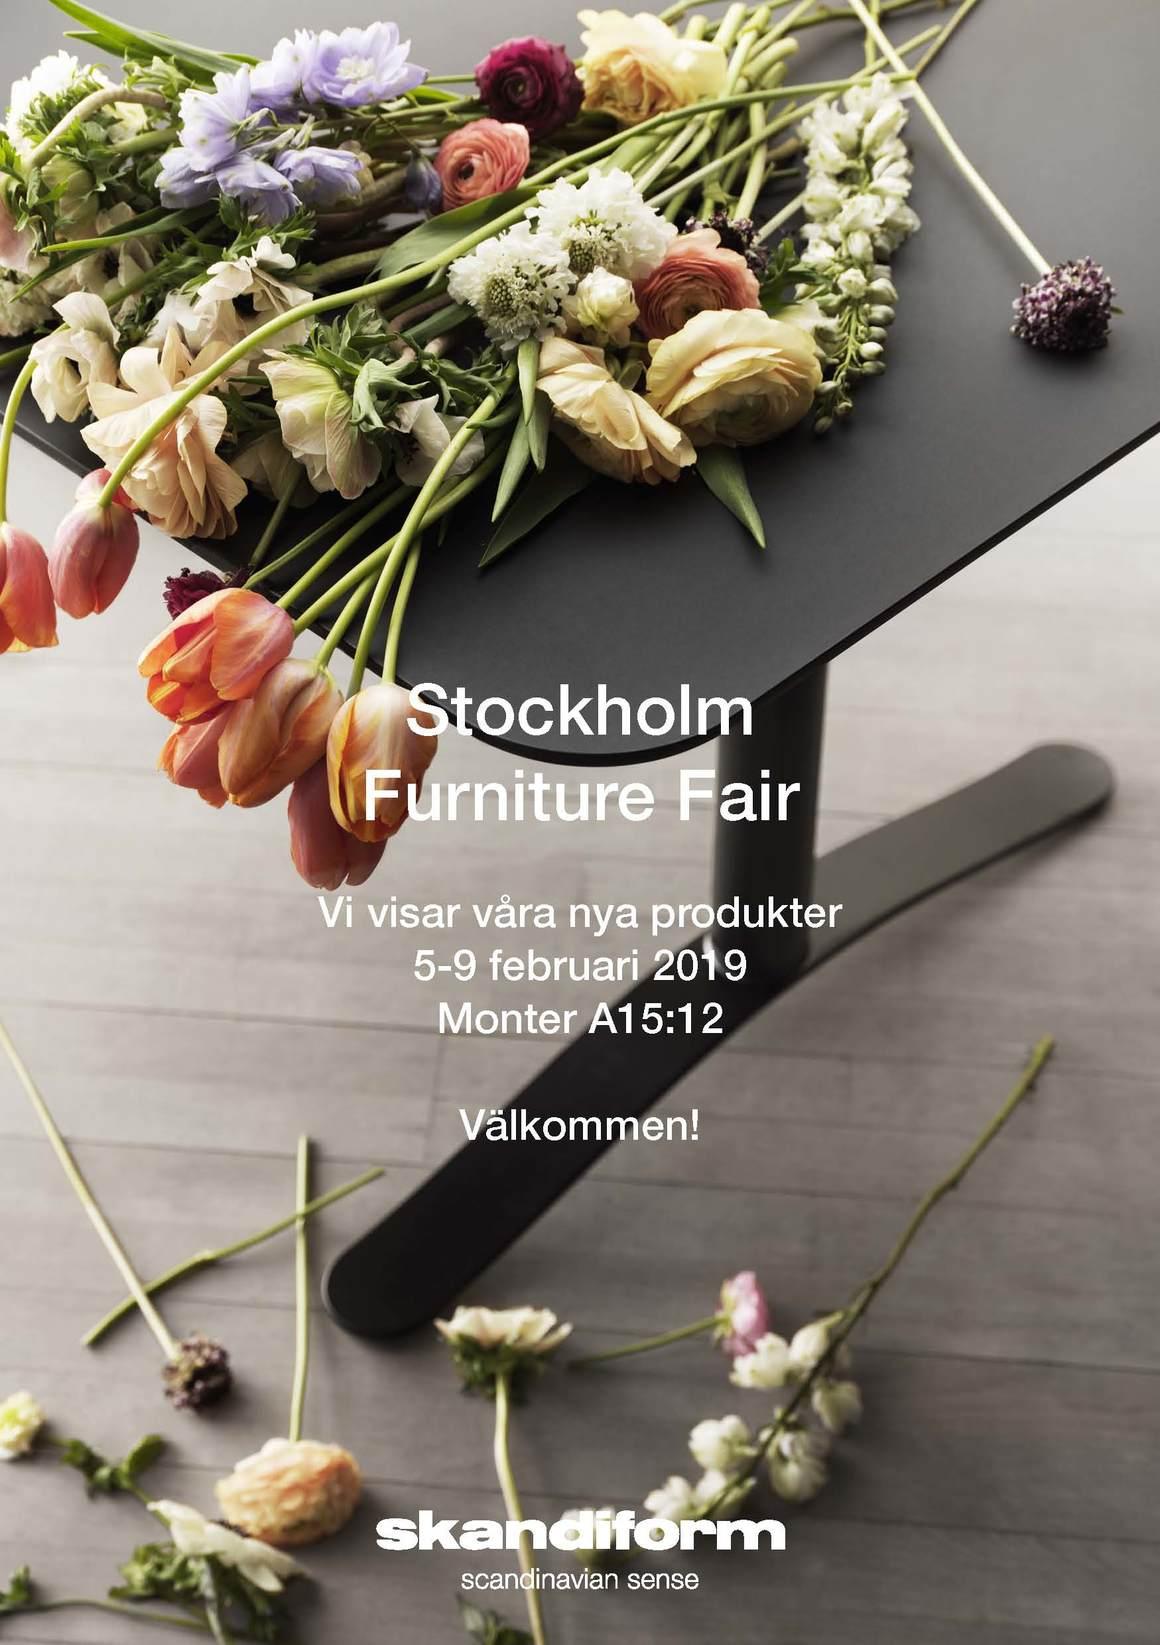 Skandiform @ Stockholm Furniture Fair 2019